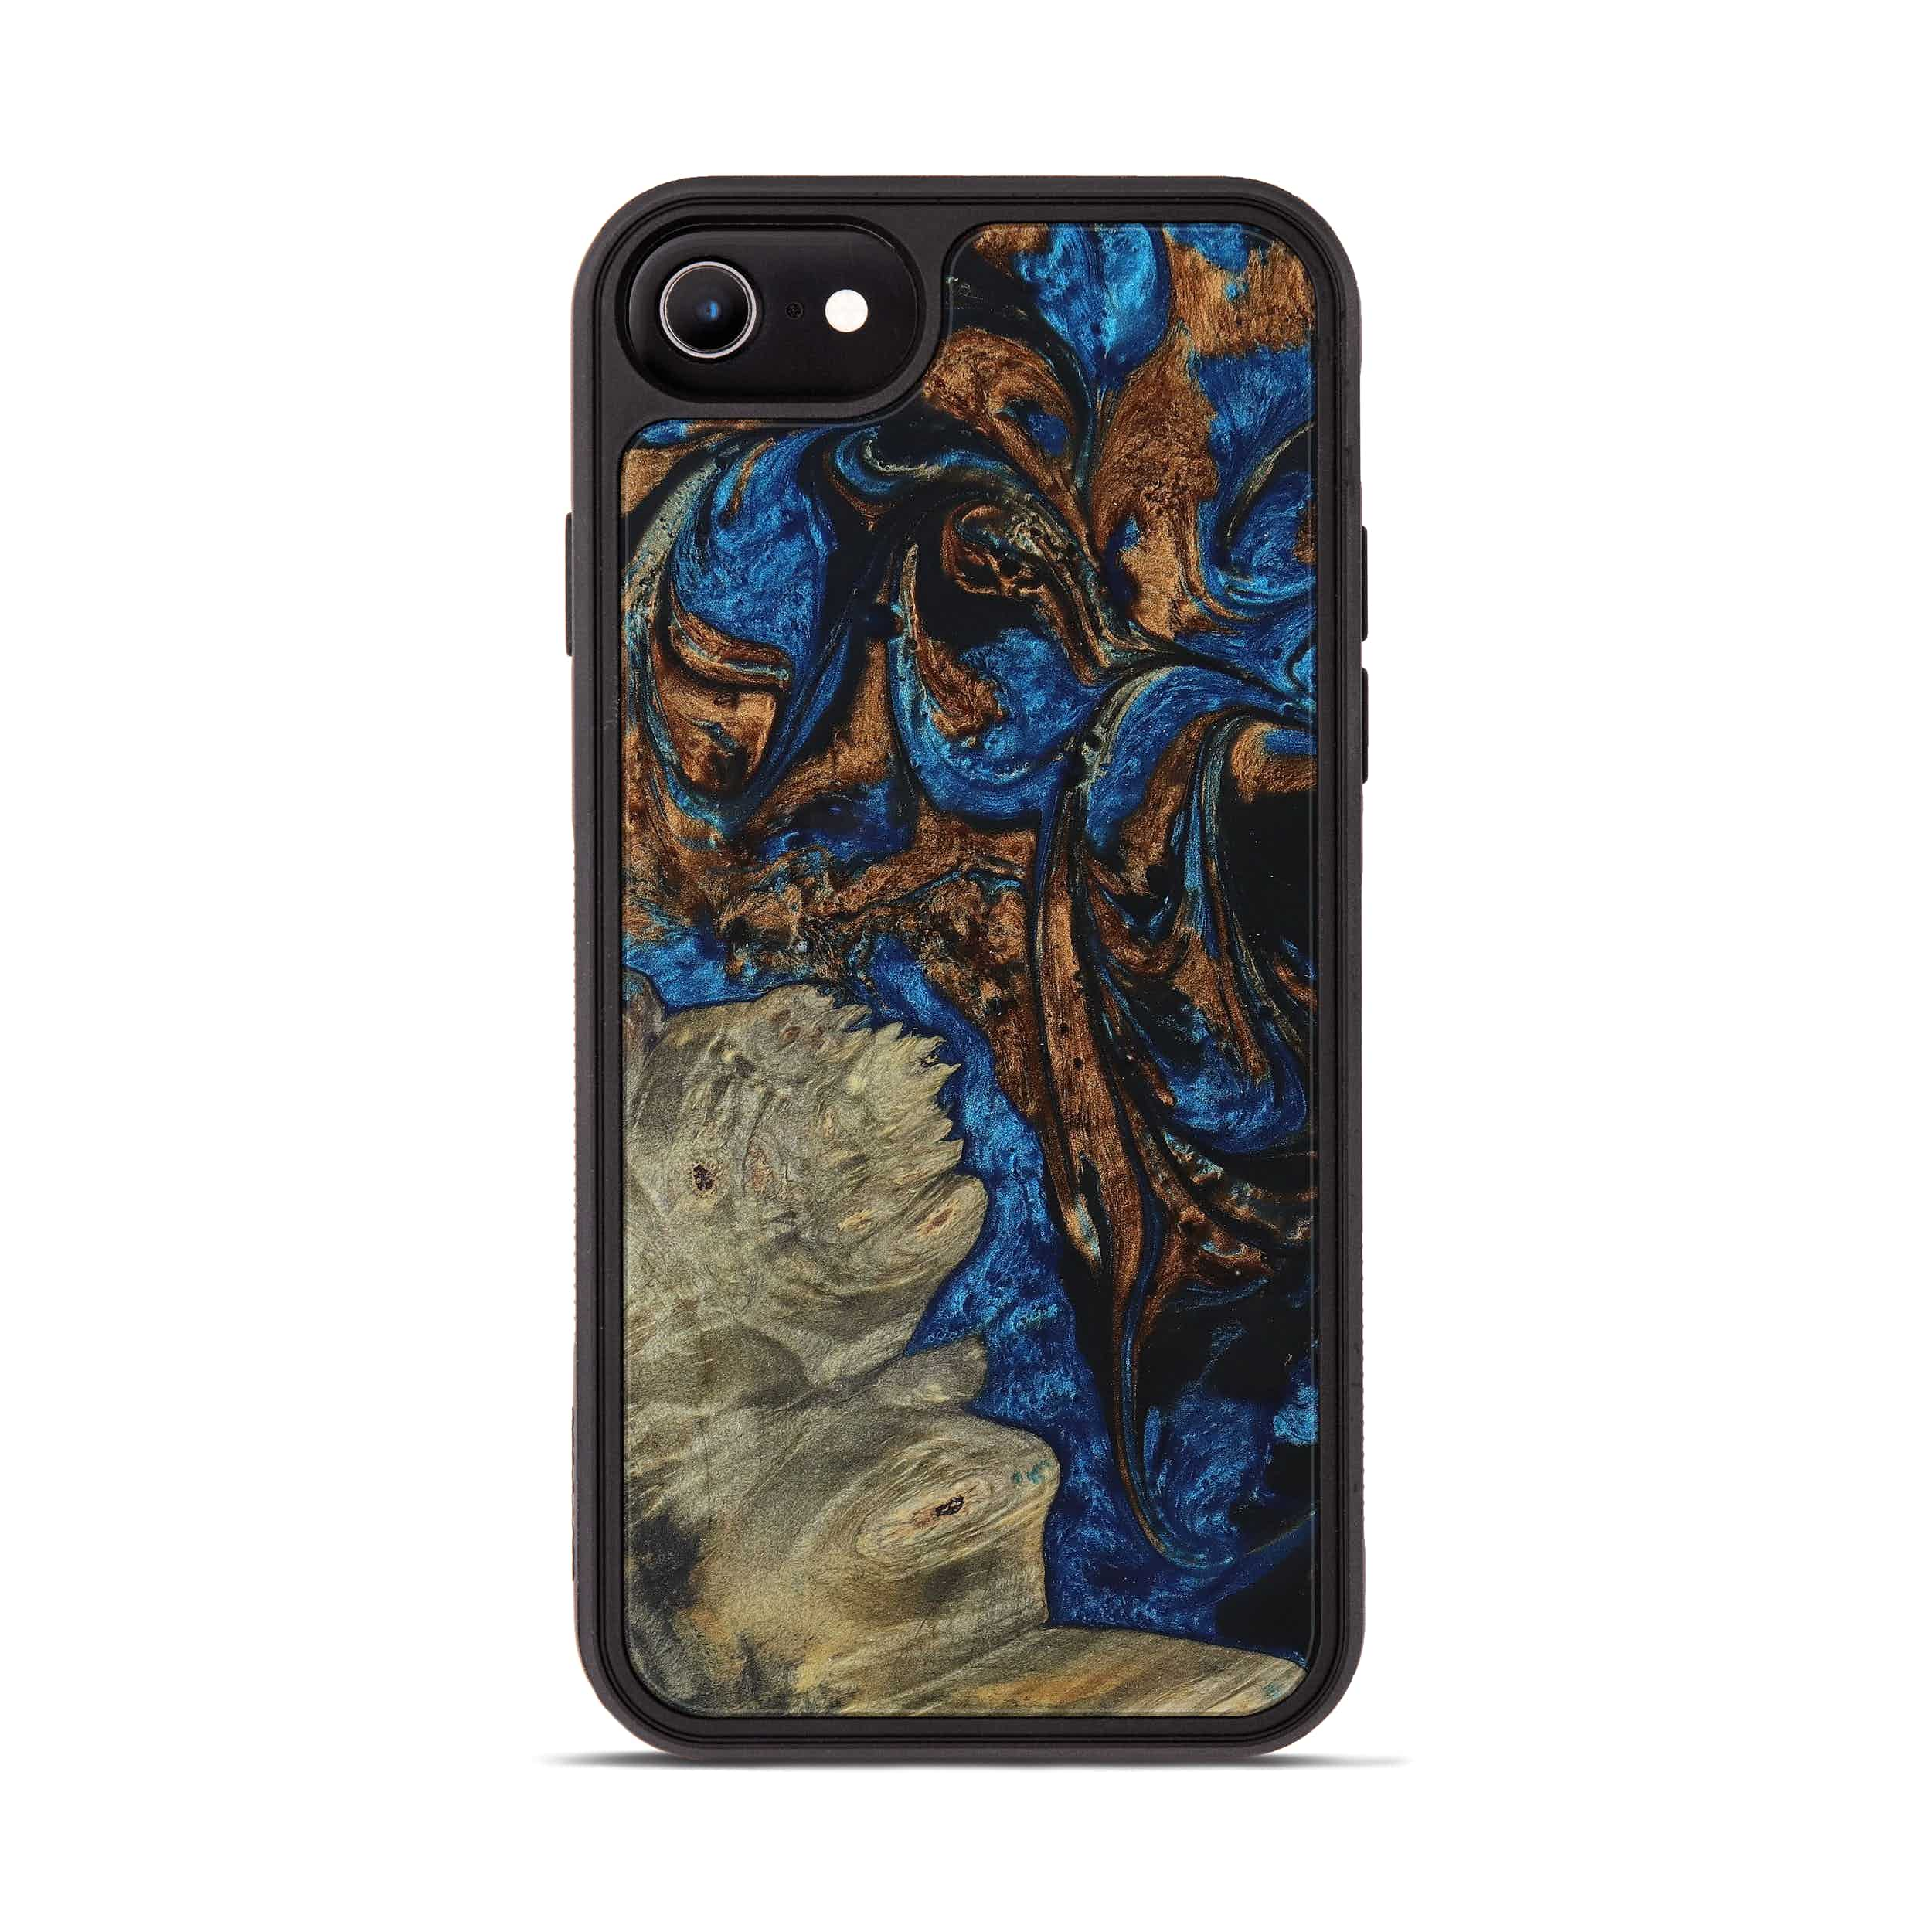 iPhone 8 Wood+Resin Phone Case - Nicolea (Teal & Gold, 394591)